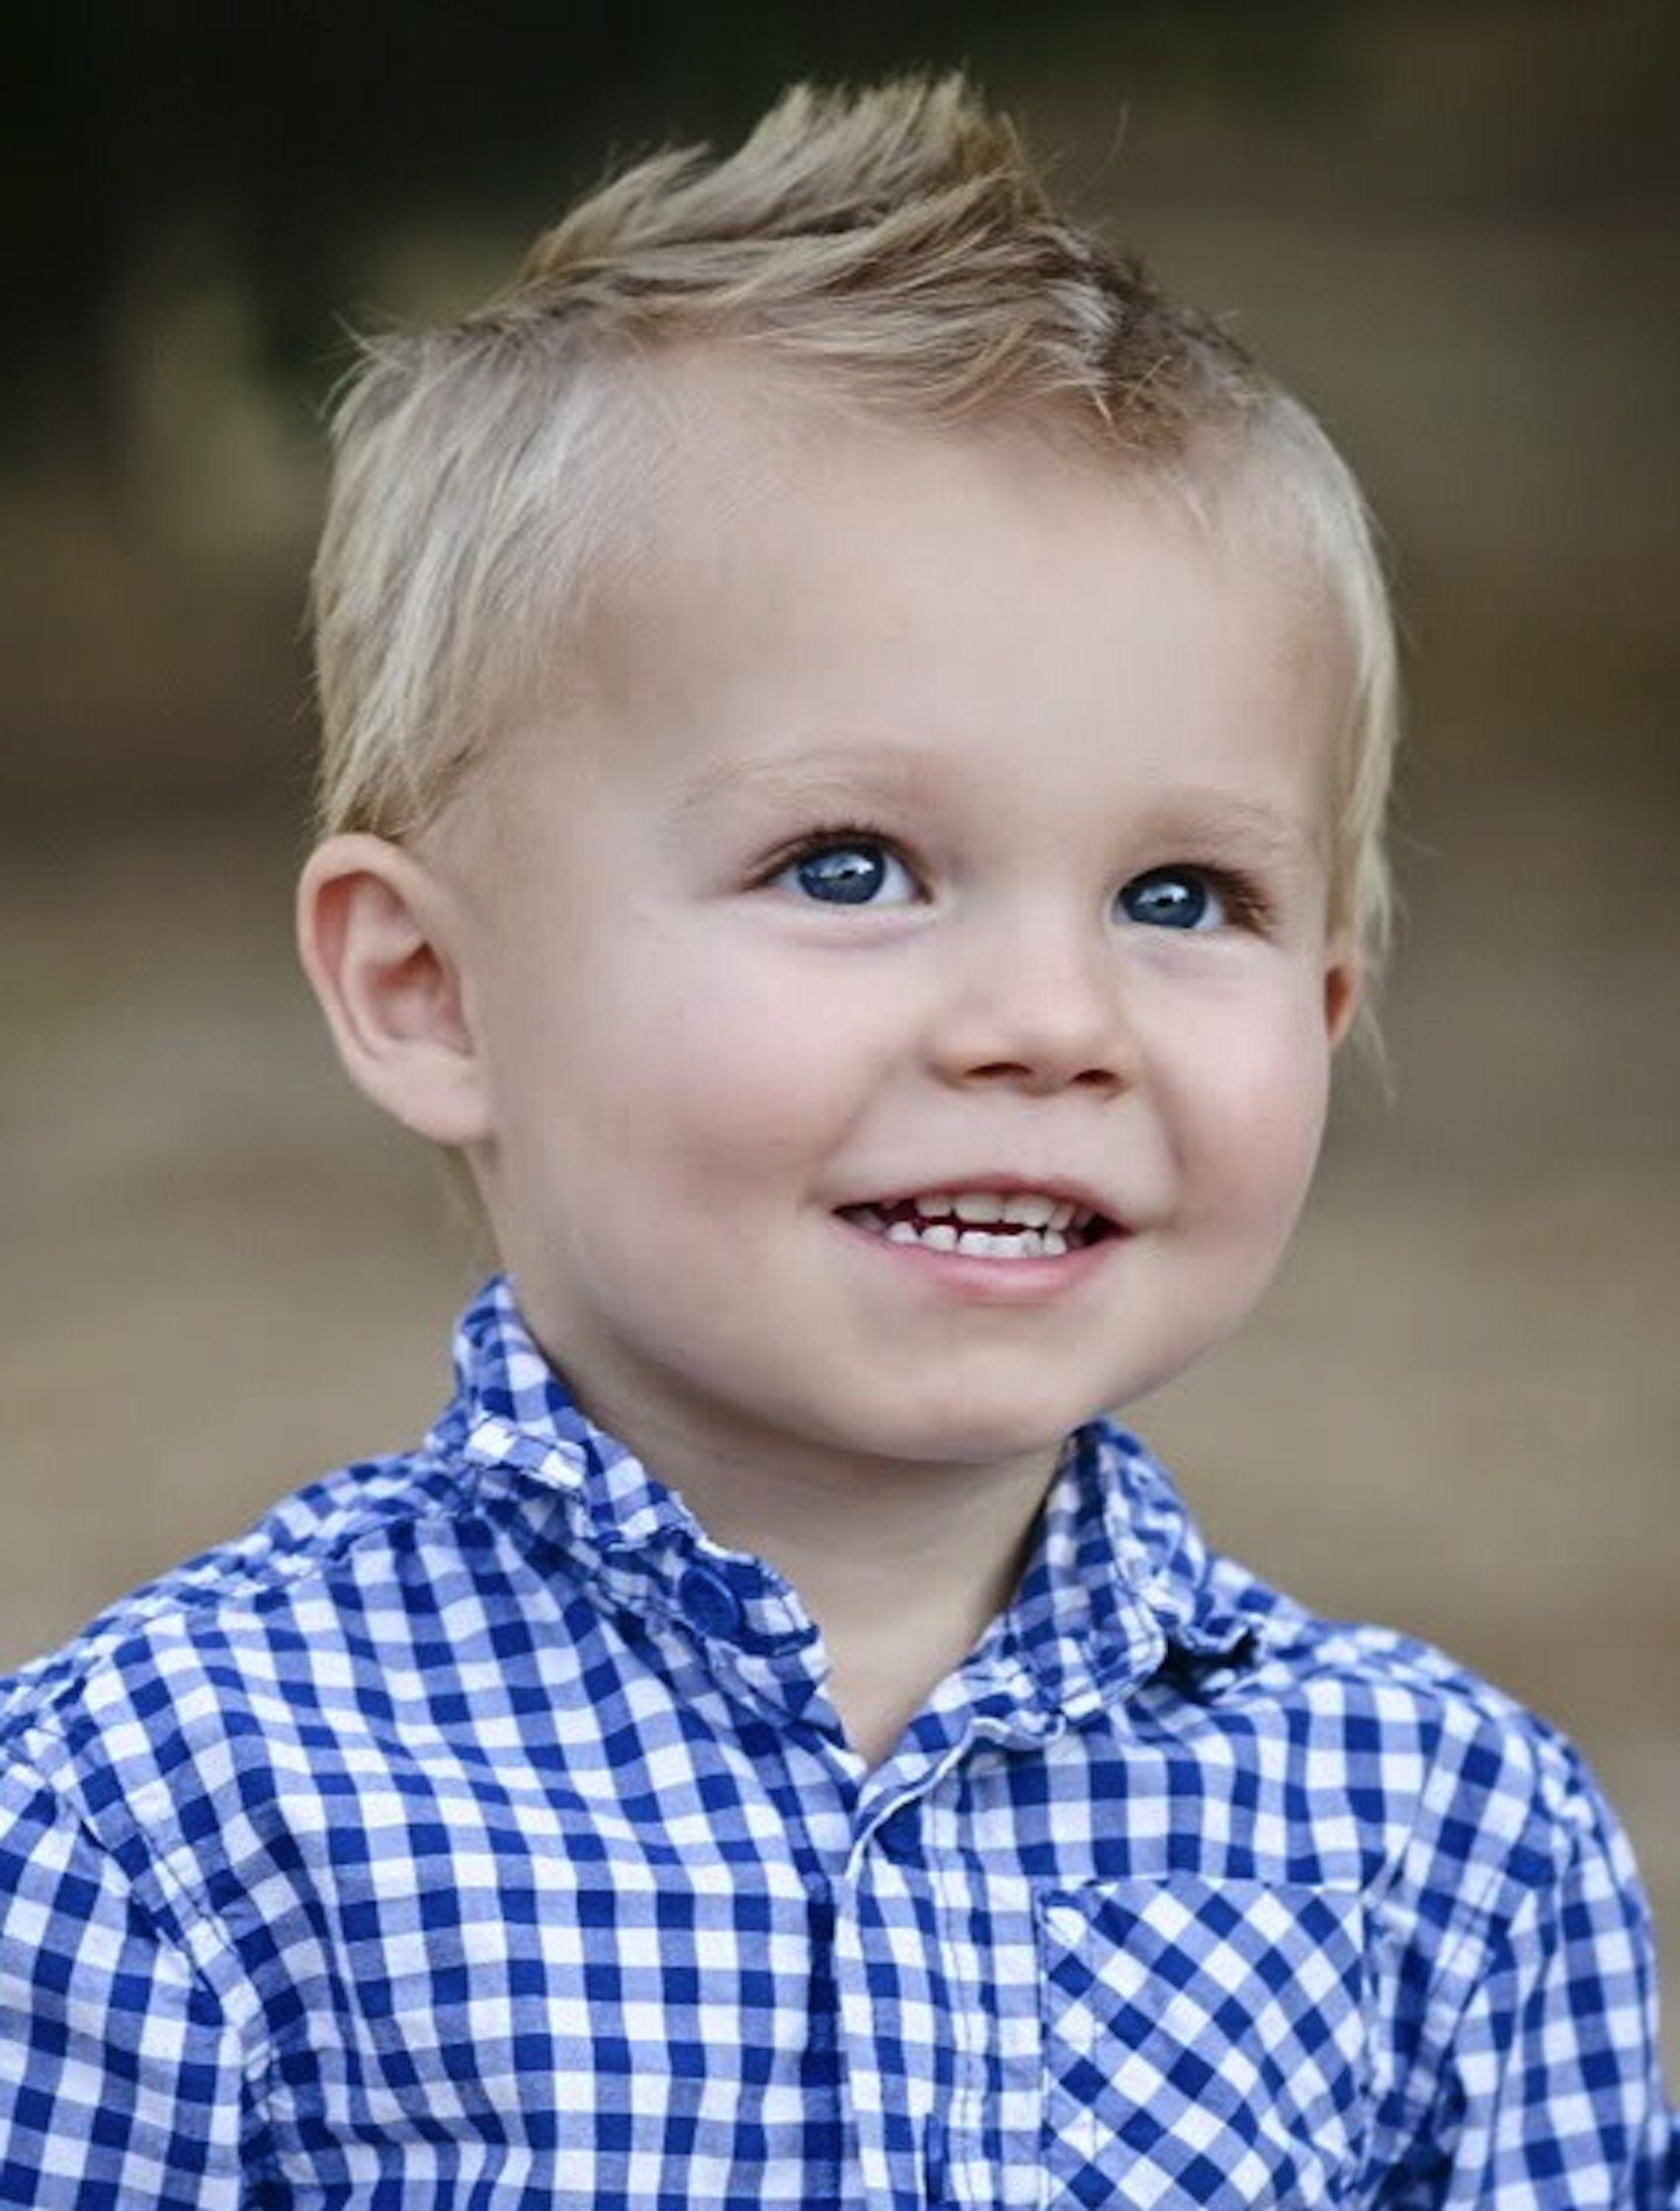 cute 2 year old child - google search | cute kids | baby boy